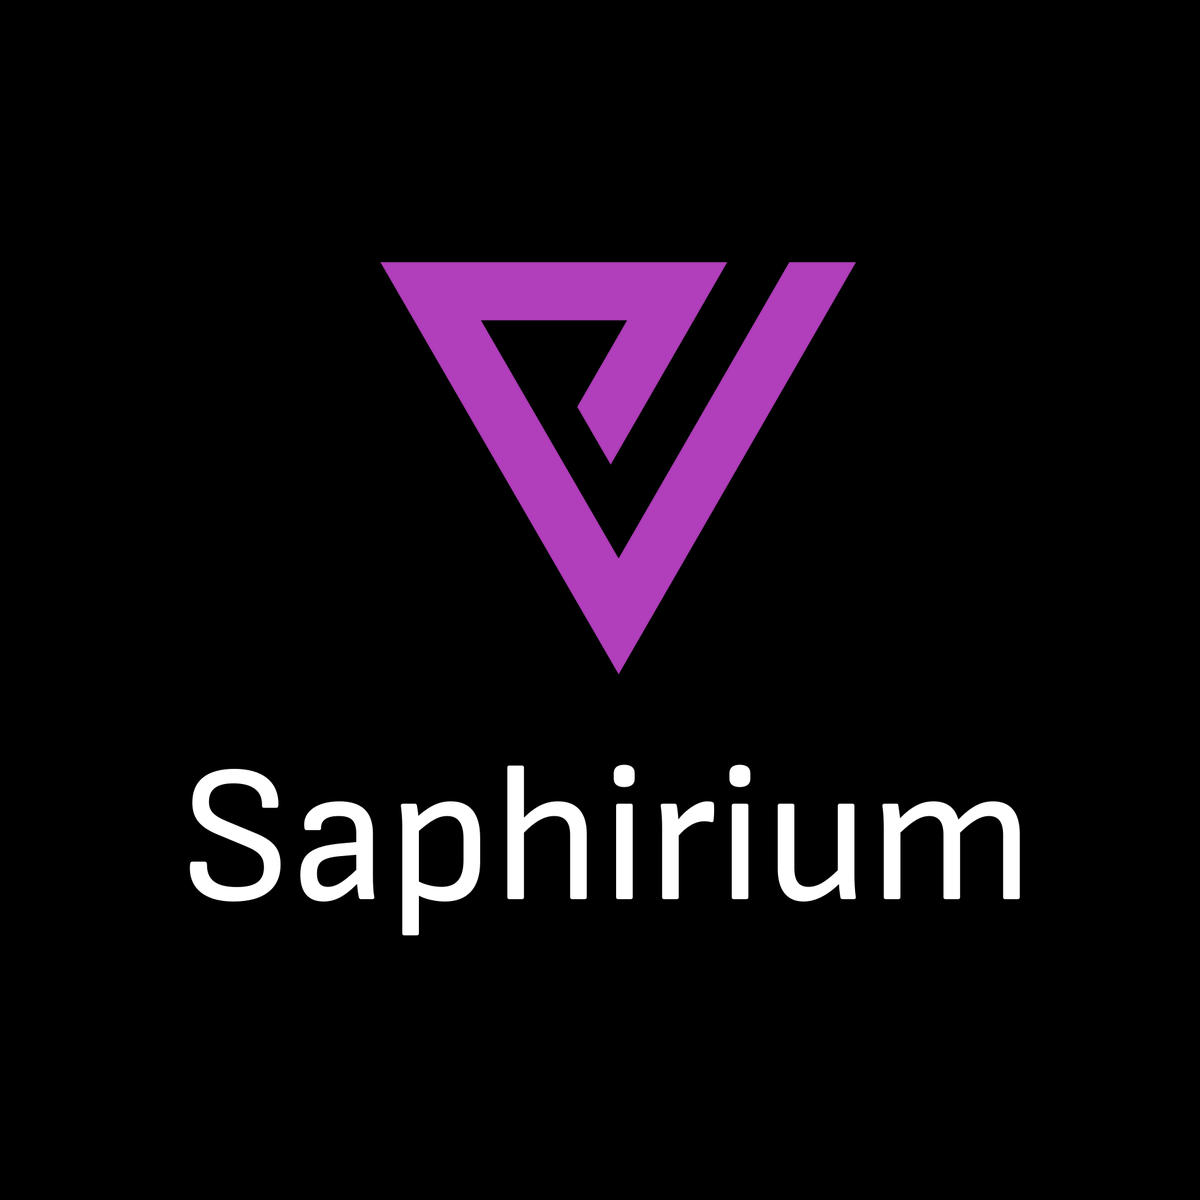 вебкам студия Saphirium Studio